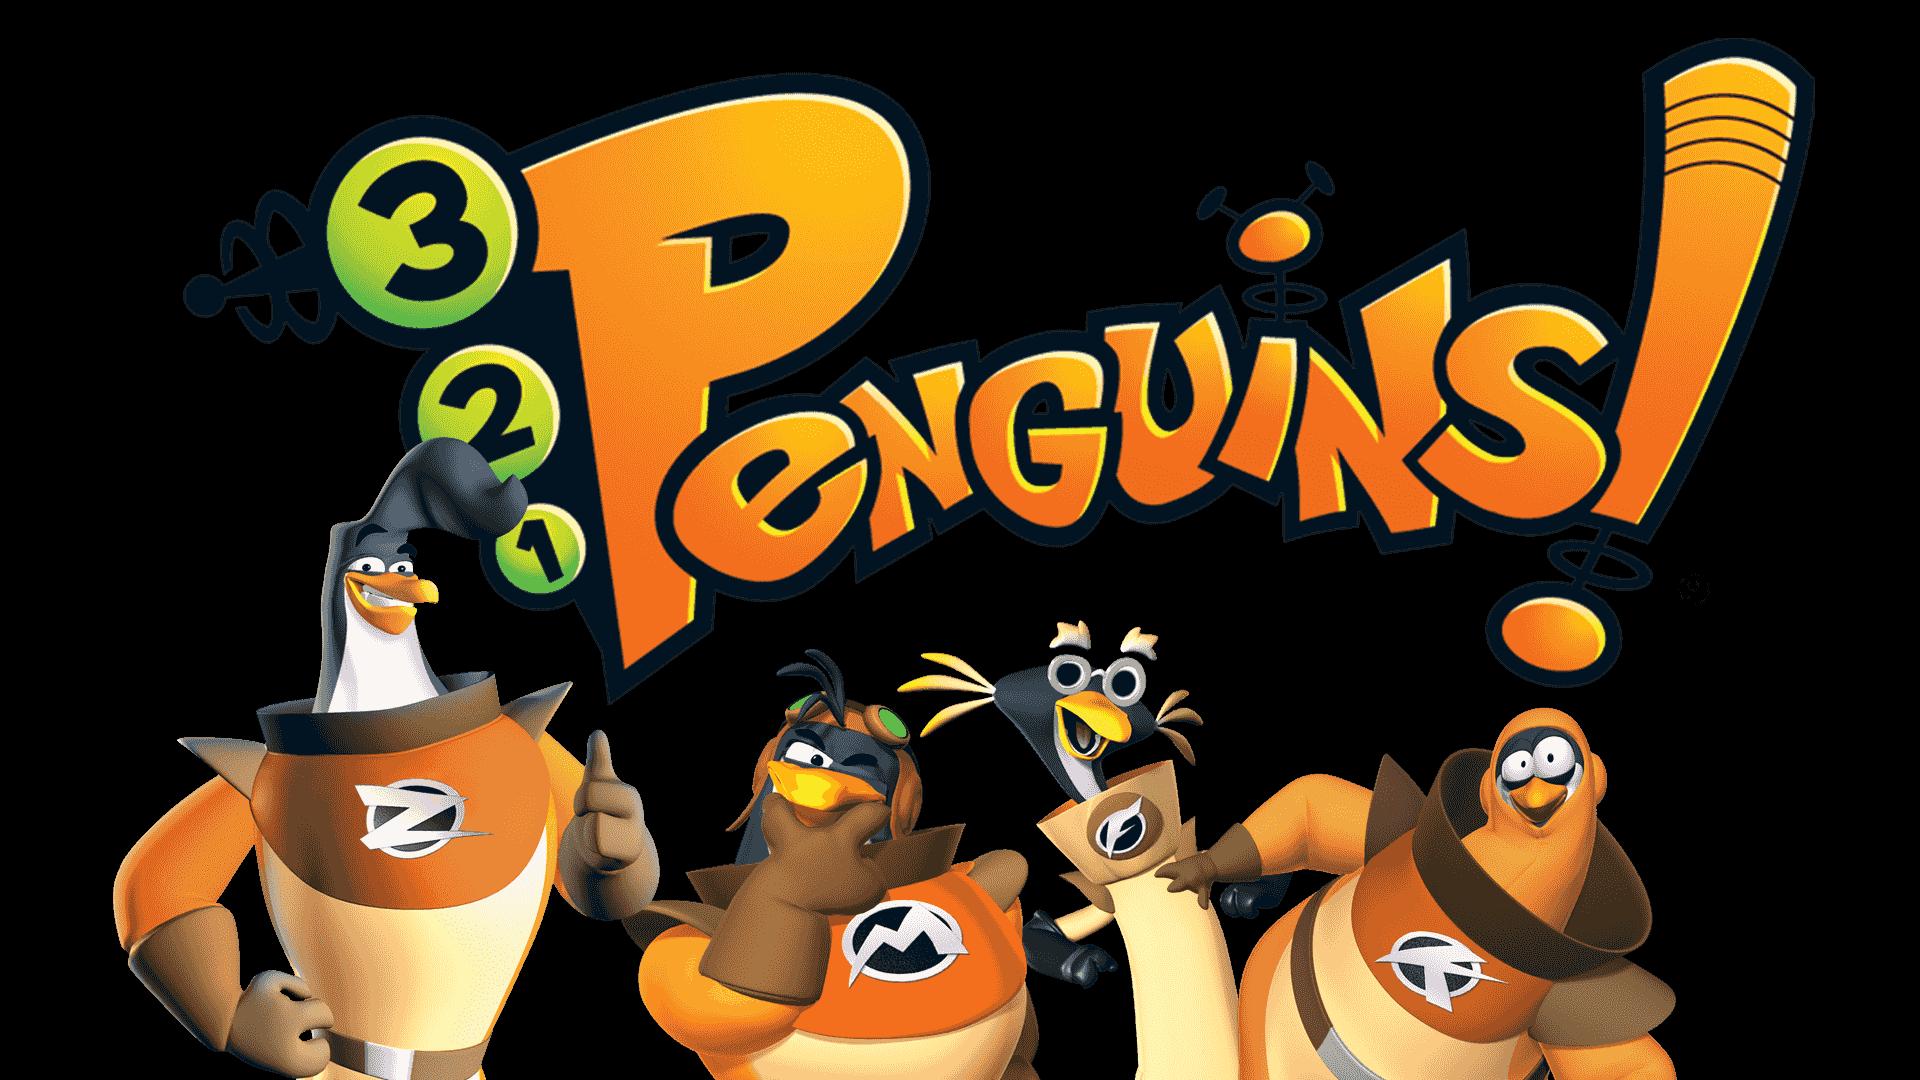 321 penguins logo